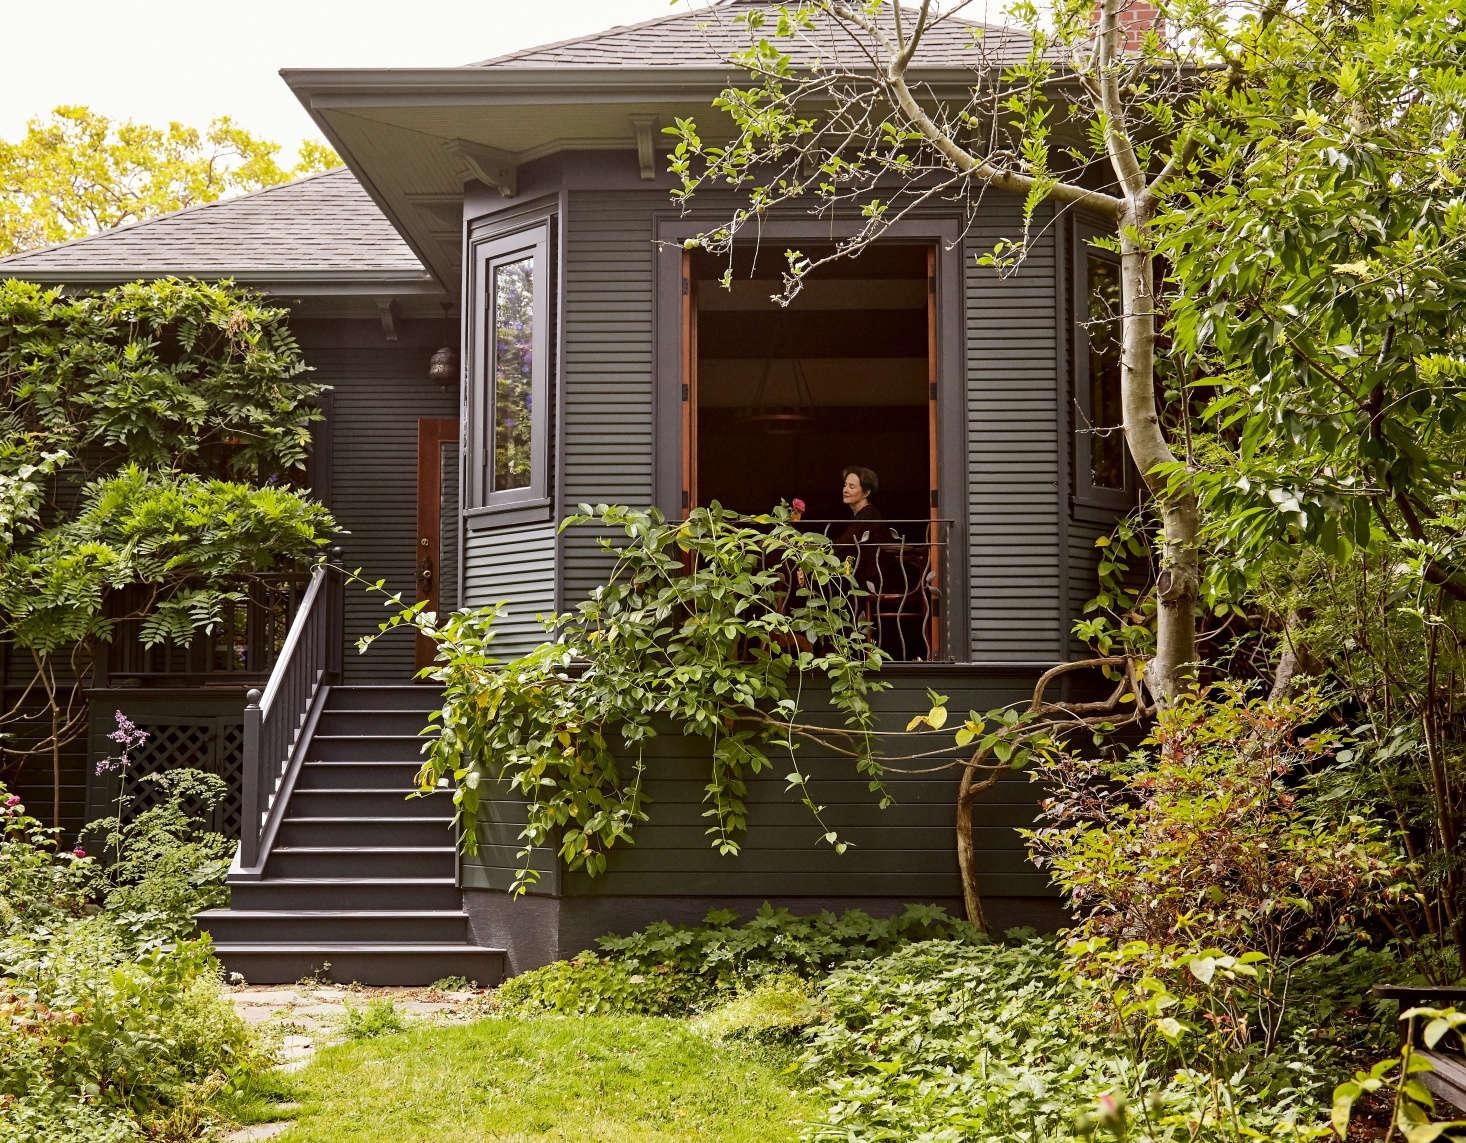 Trending on Gardenista: The Garden Apartment - Remodelista